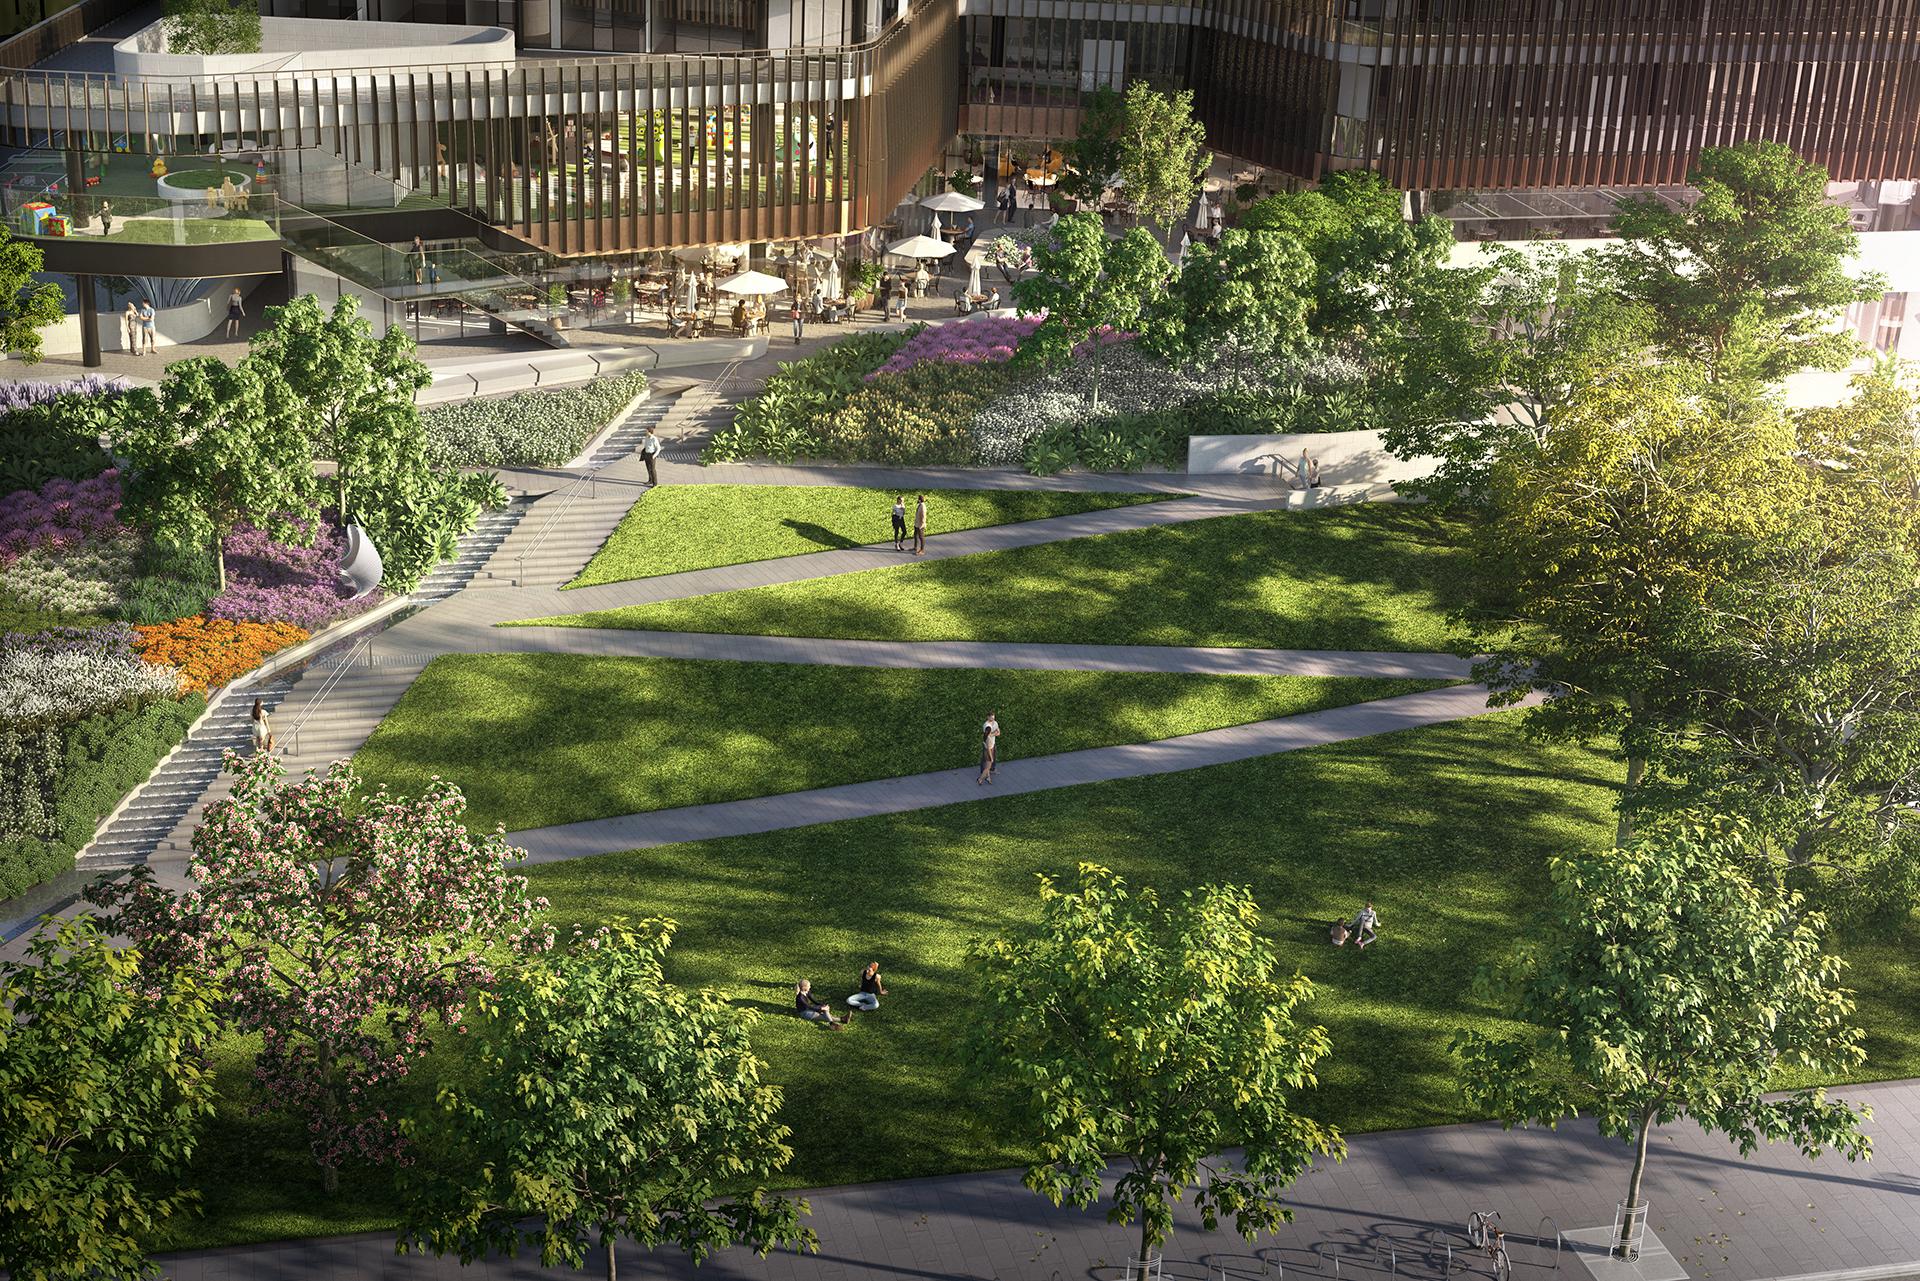 OSKH9386 Melbourne Square EA06 Aerial Park